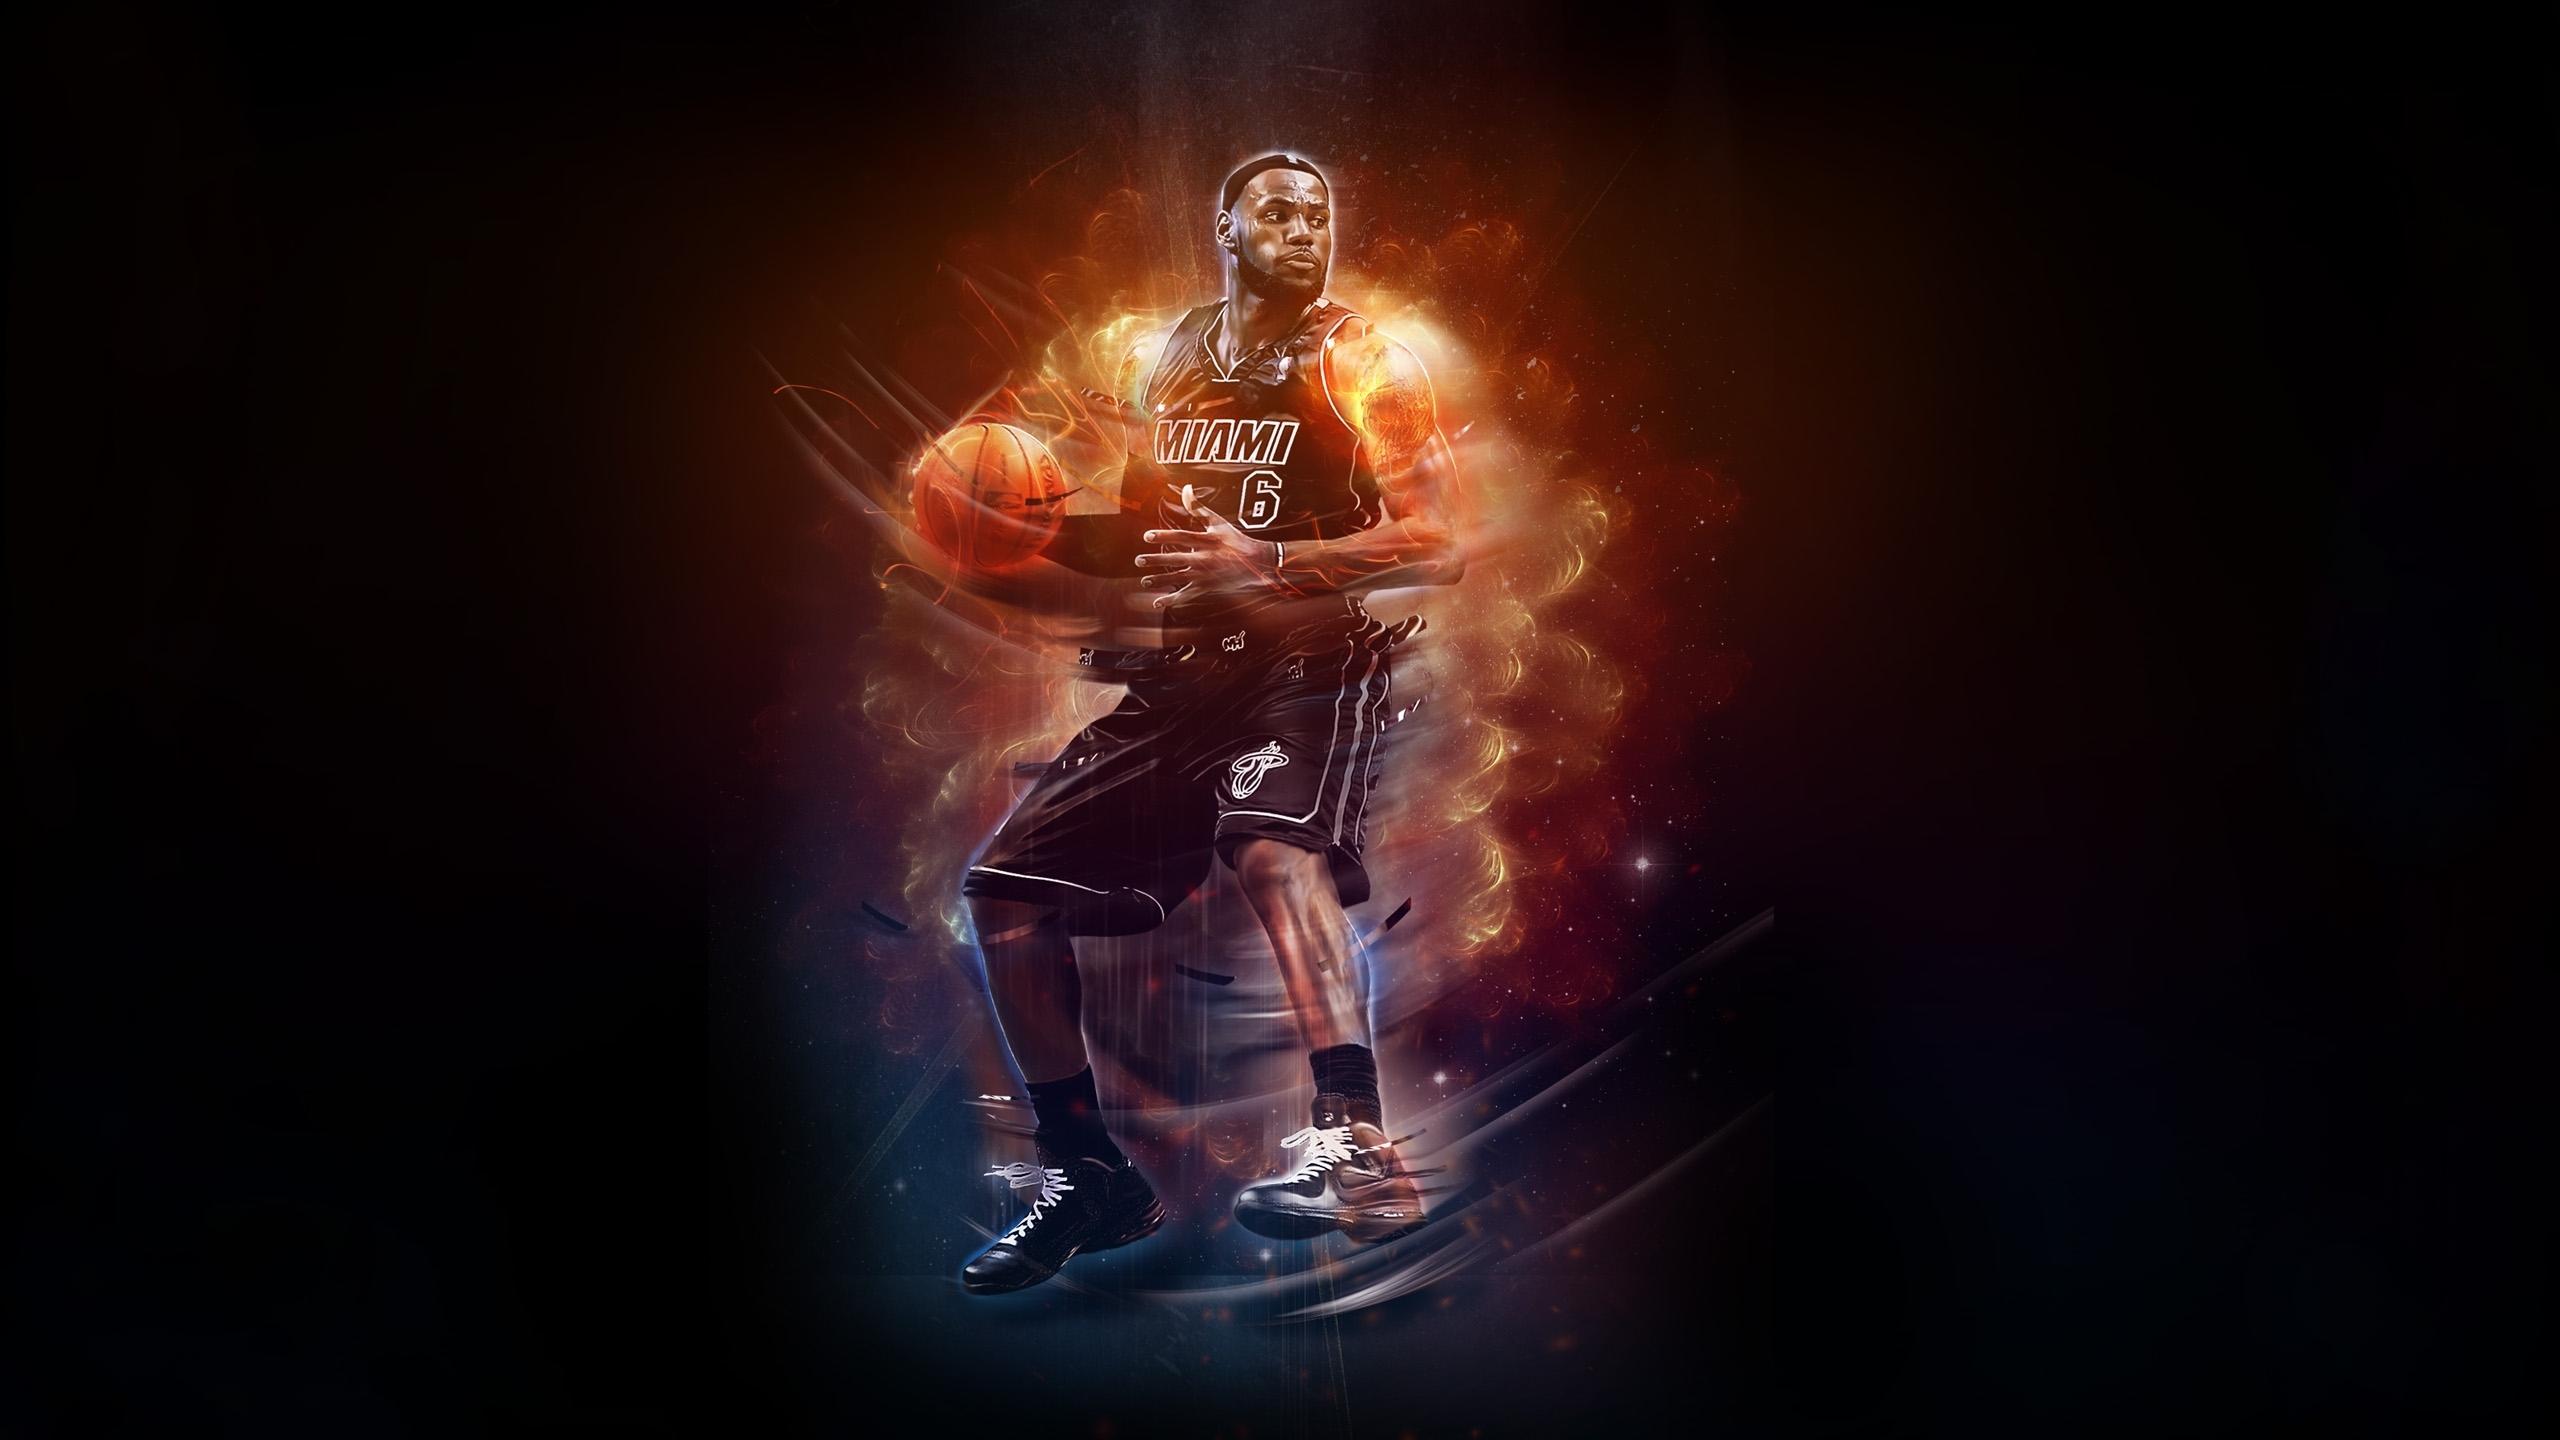 Wallpaper lebron james nba basketball basketball miami heat 6 2560x1440